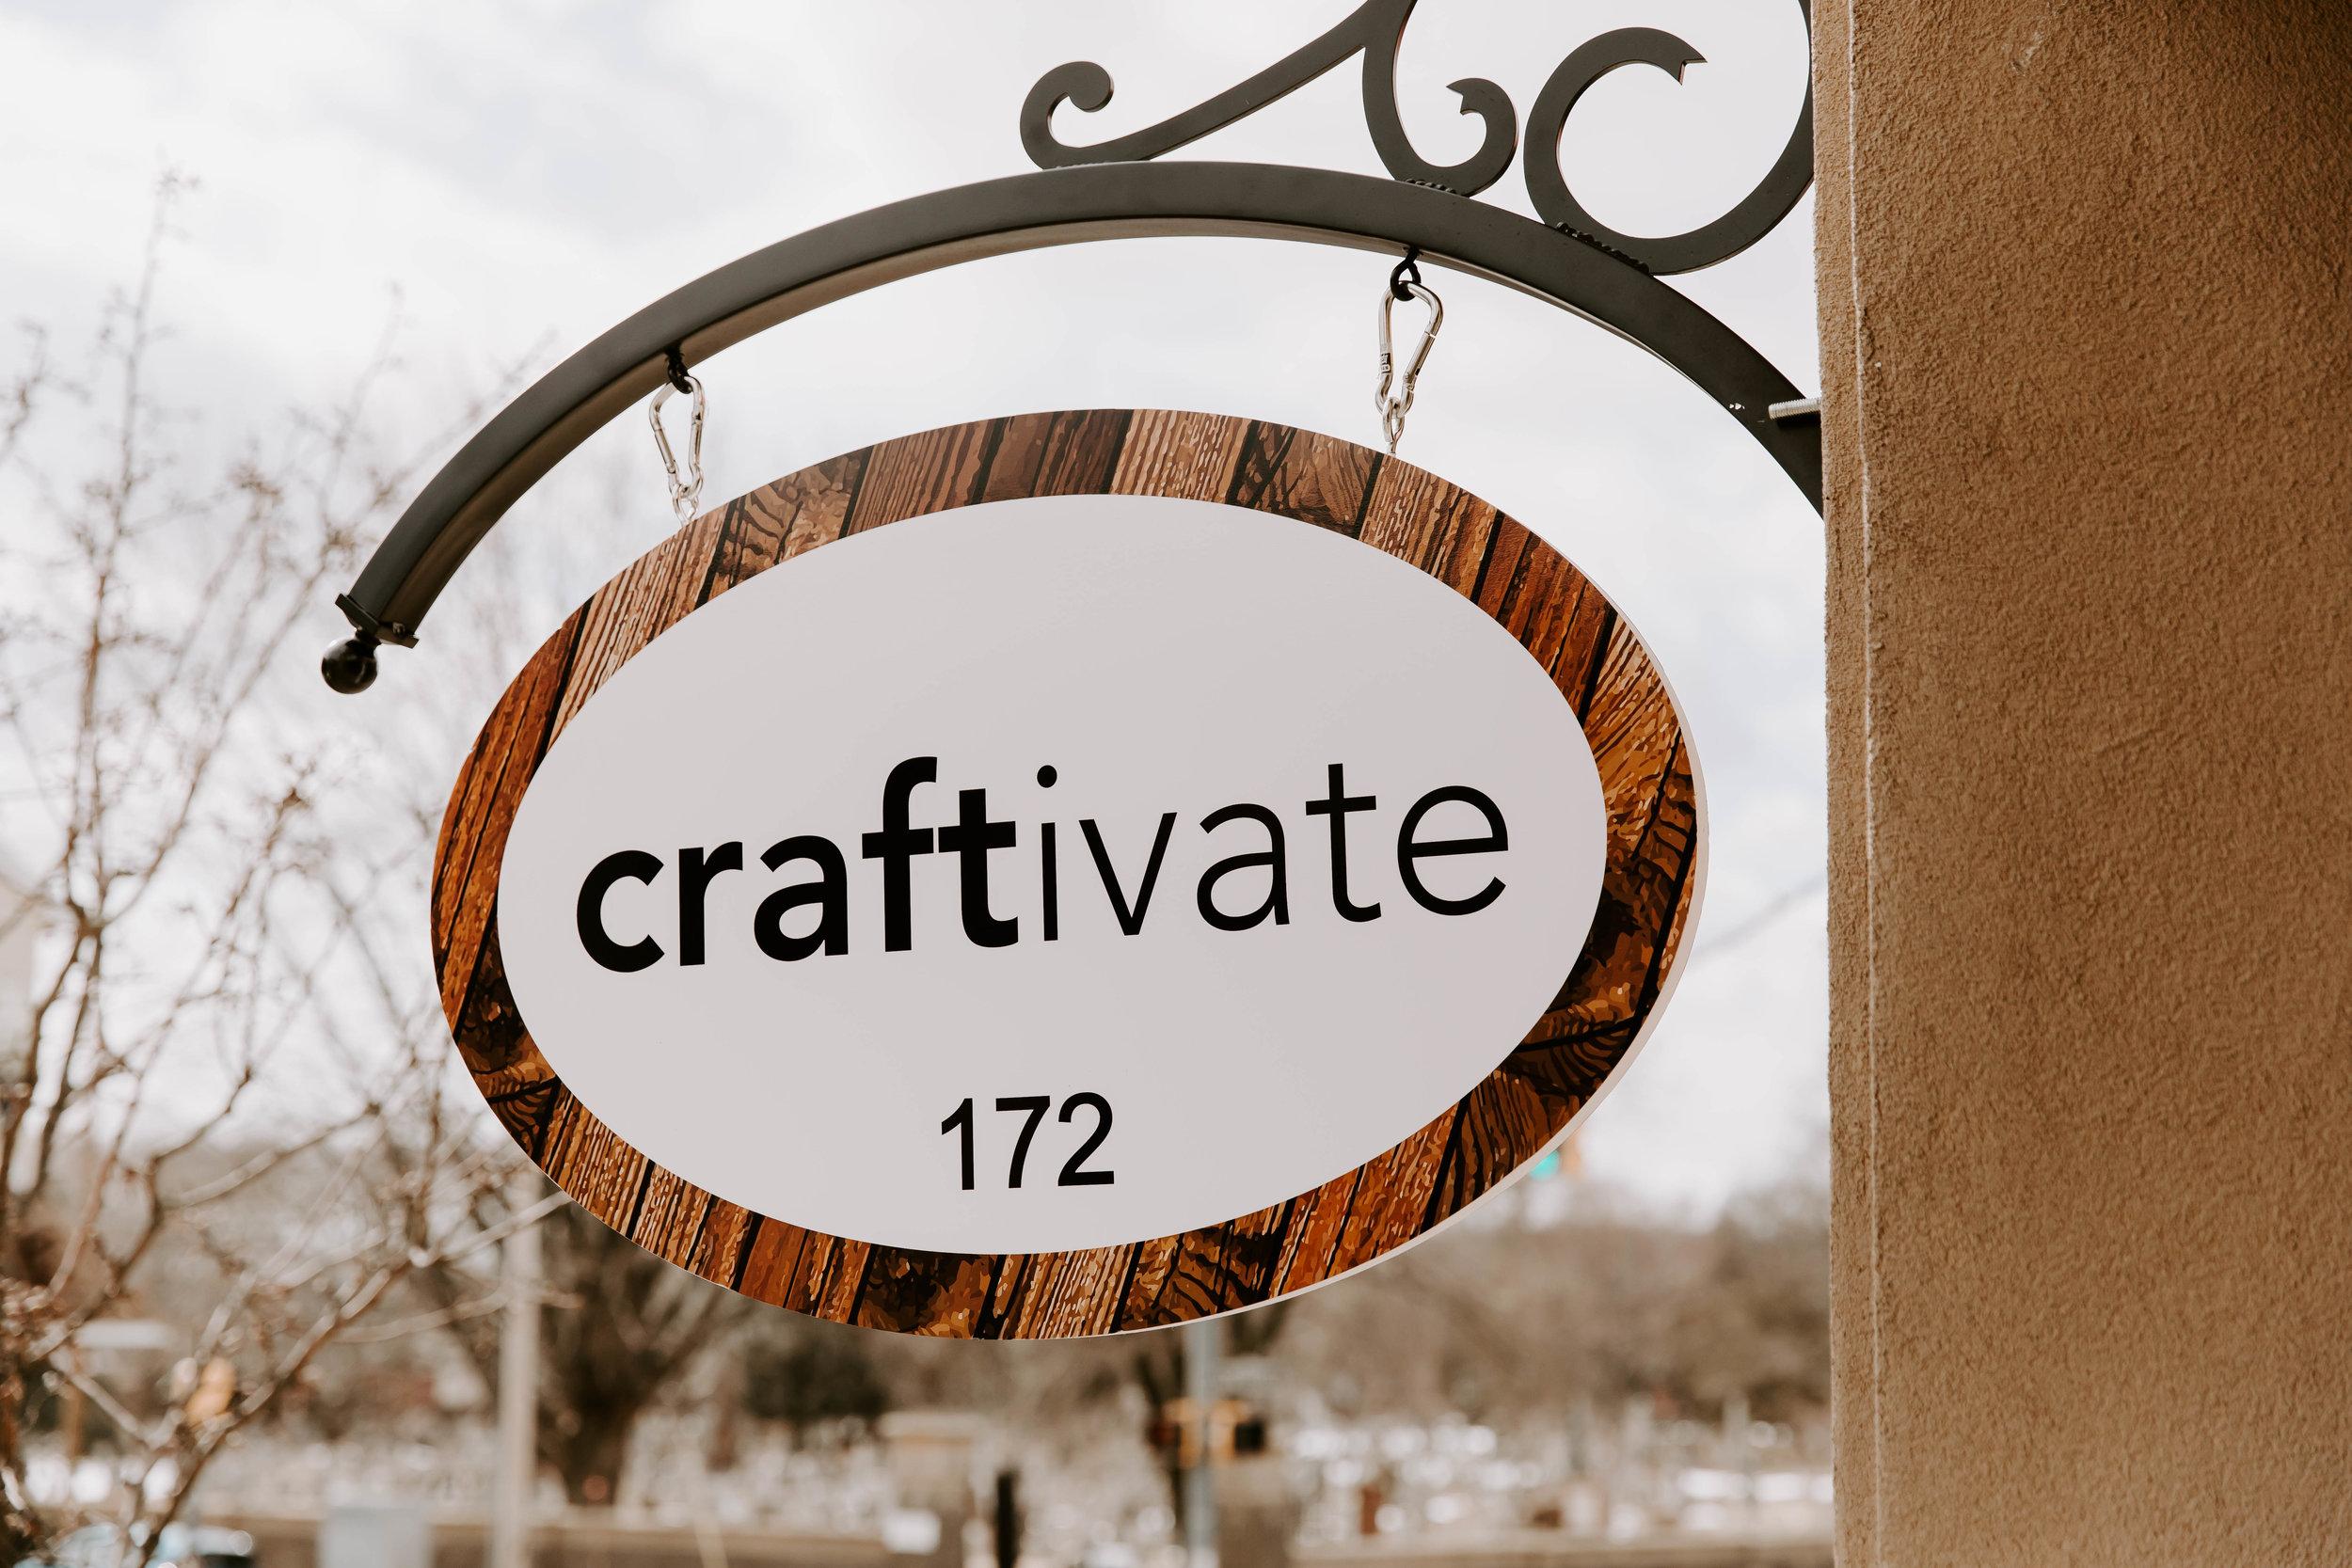 Craftivate_0180.jpg